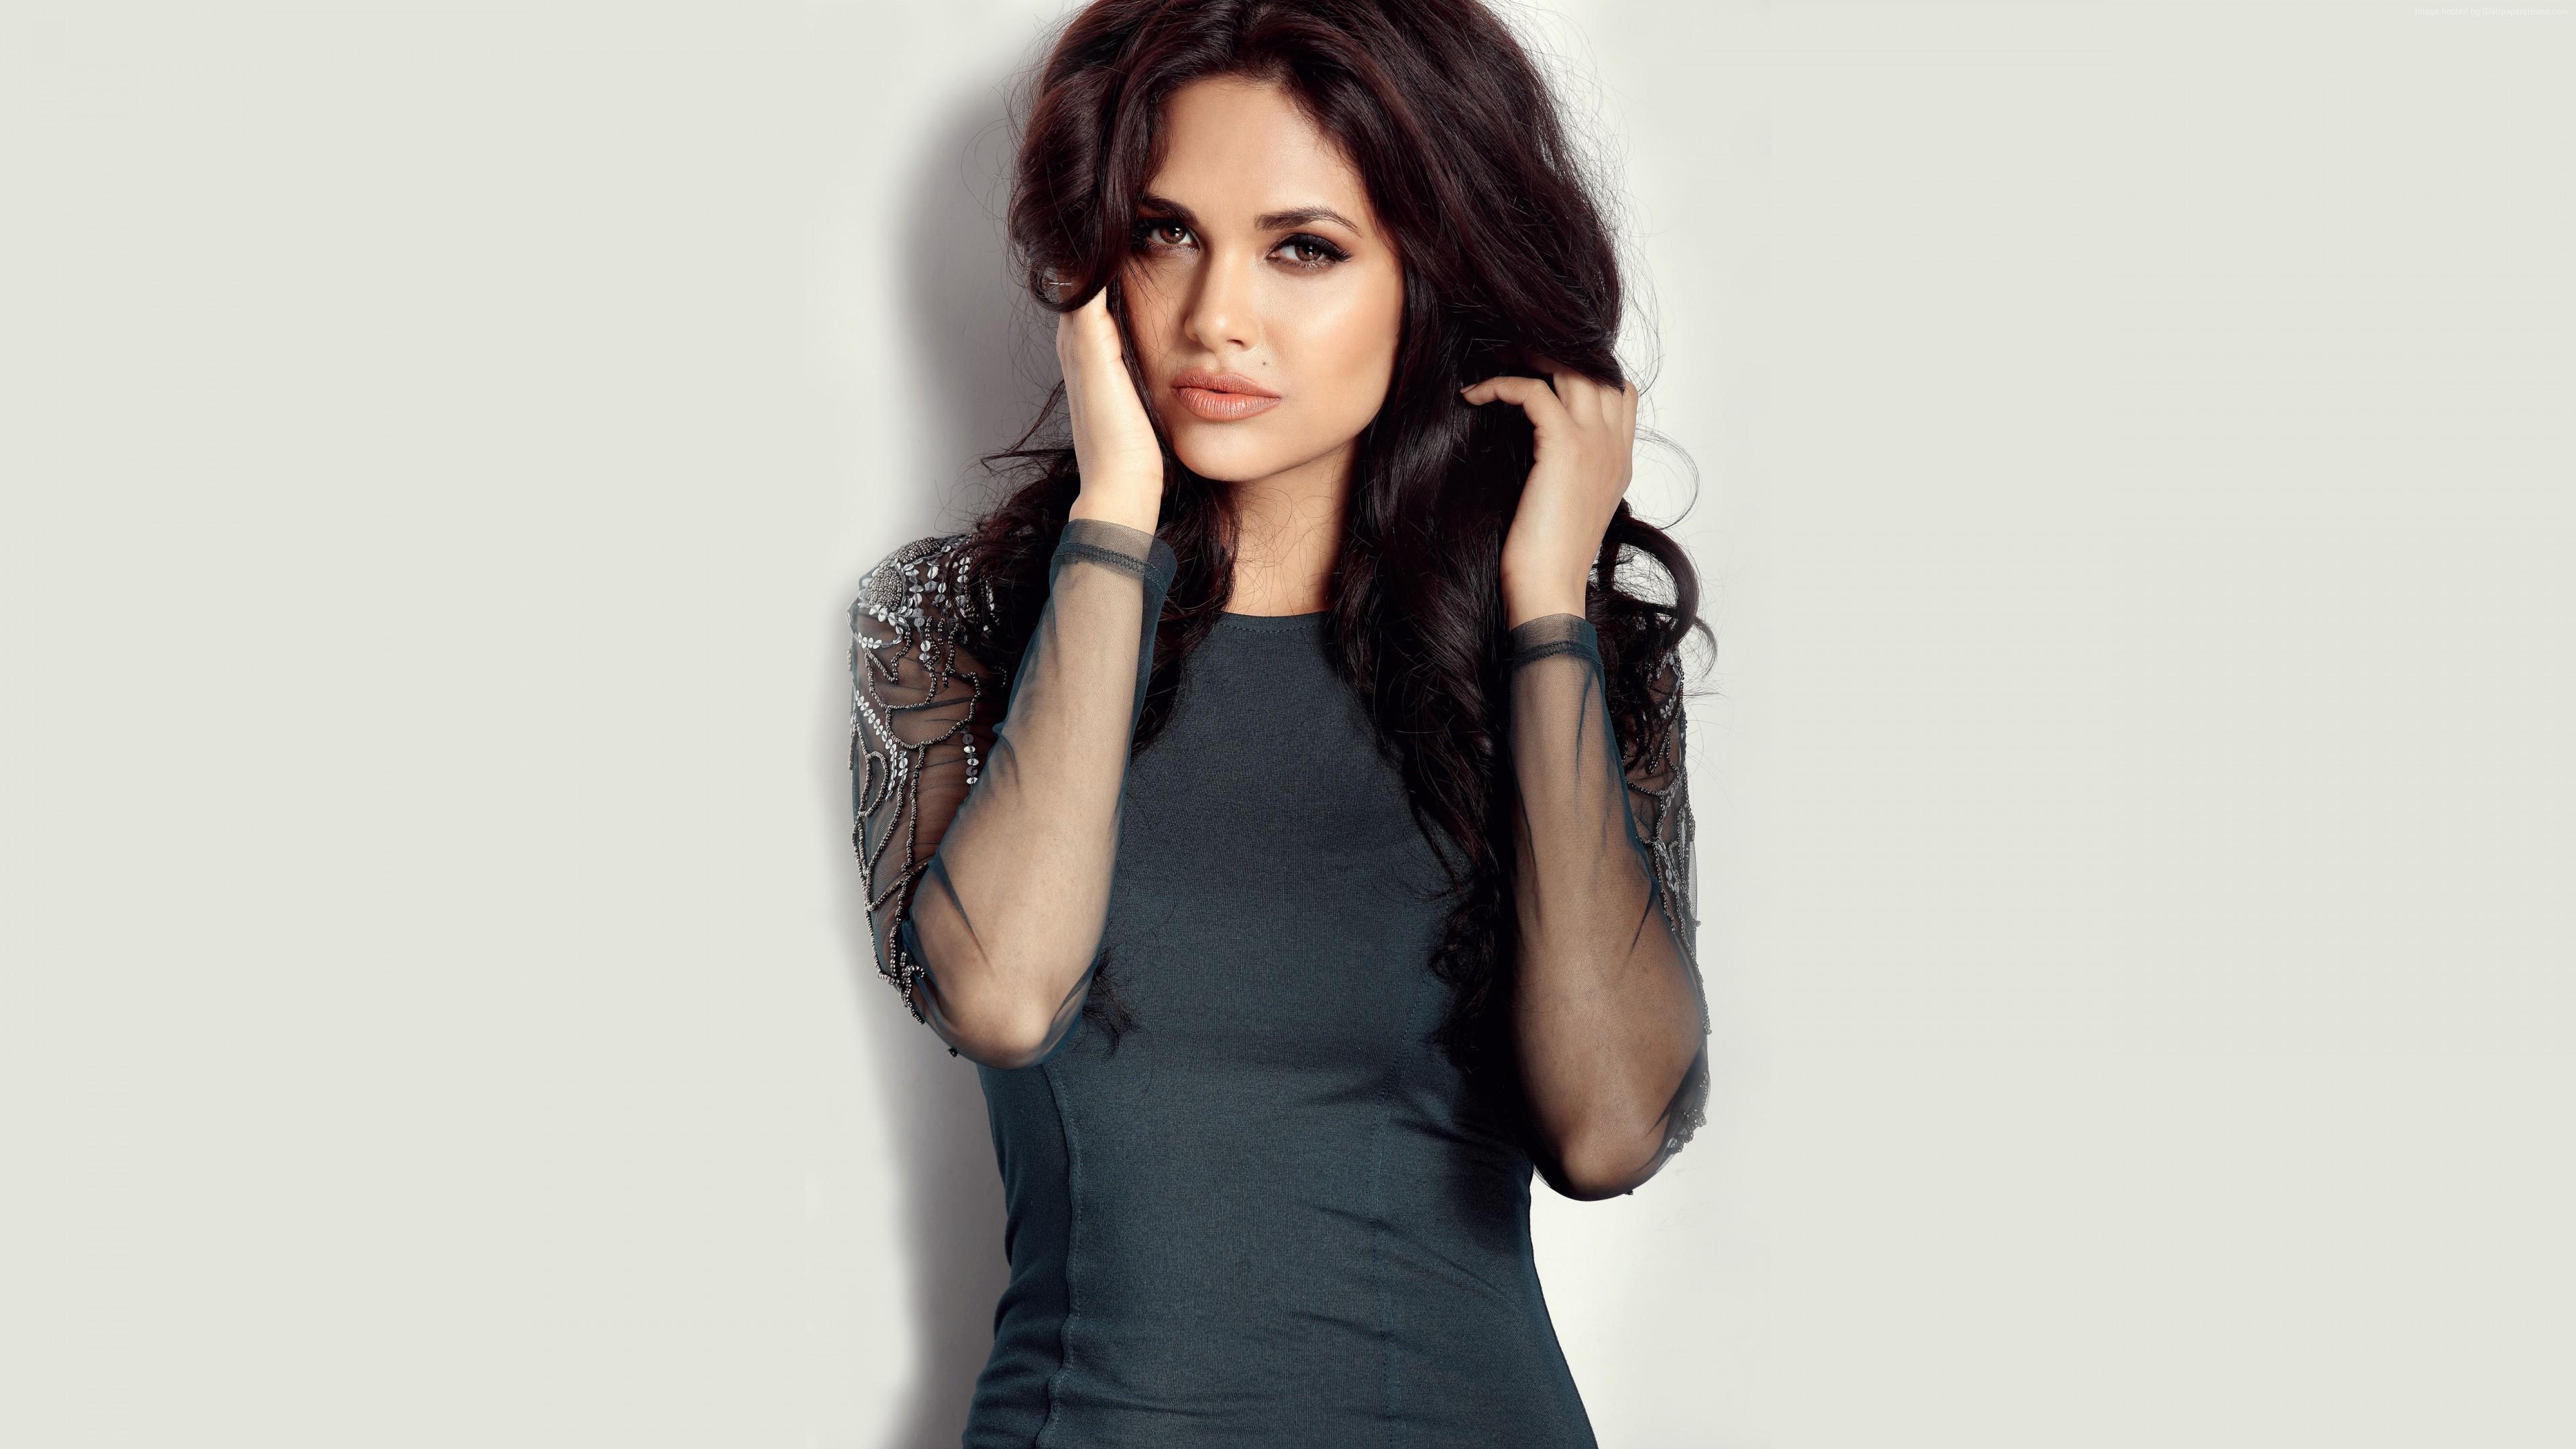 Wallpaper Esha Gupta, Hot, Bollywood, 5k, Celebrities 5k